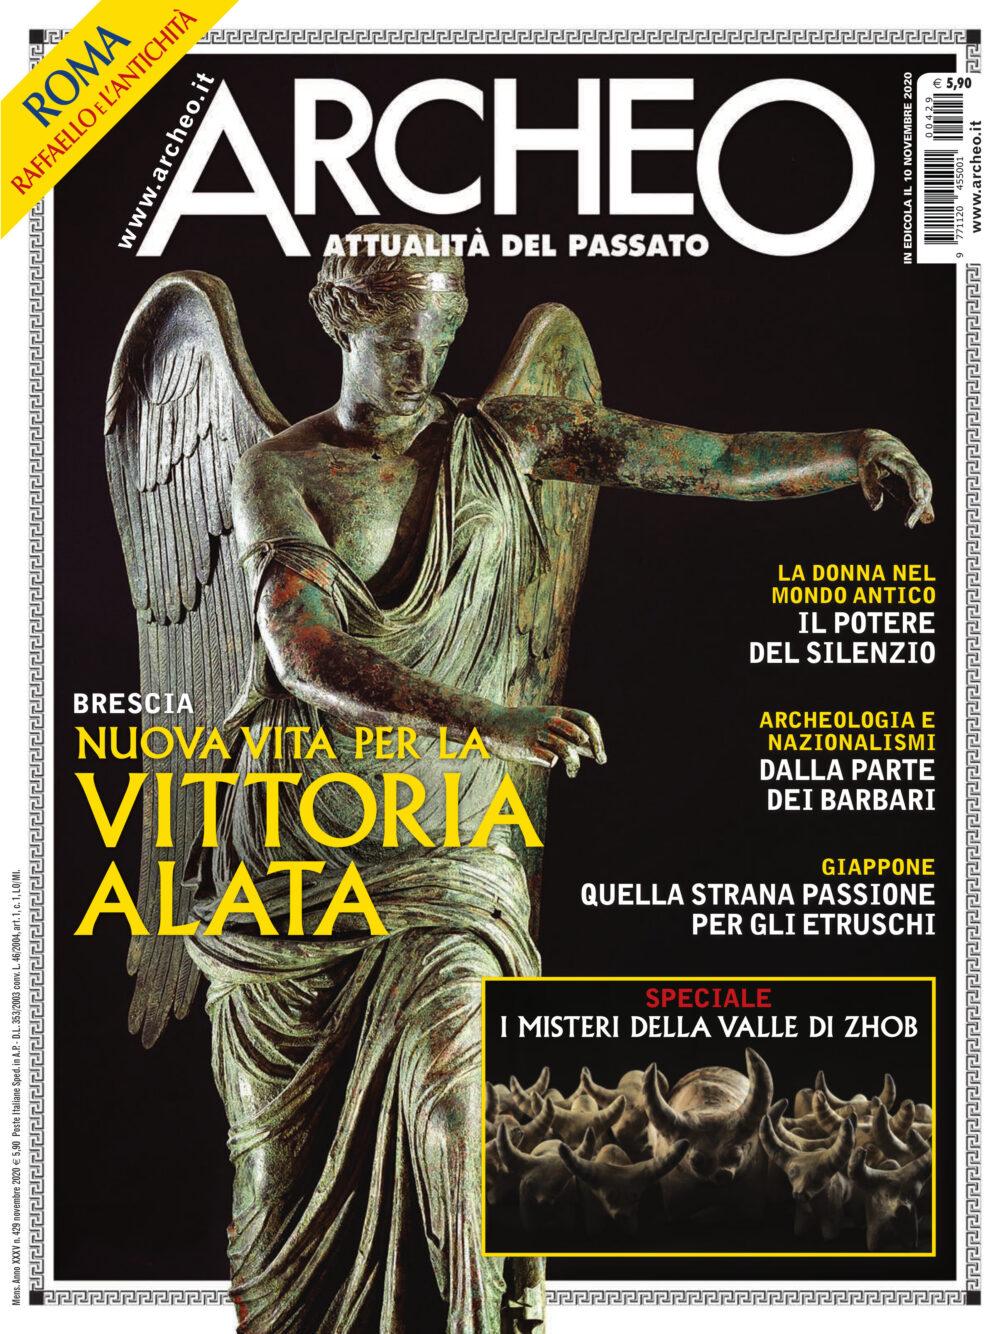 Copertina di Archeo n. 429, Novembre 2020